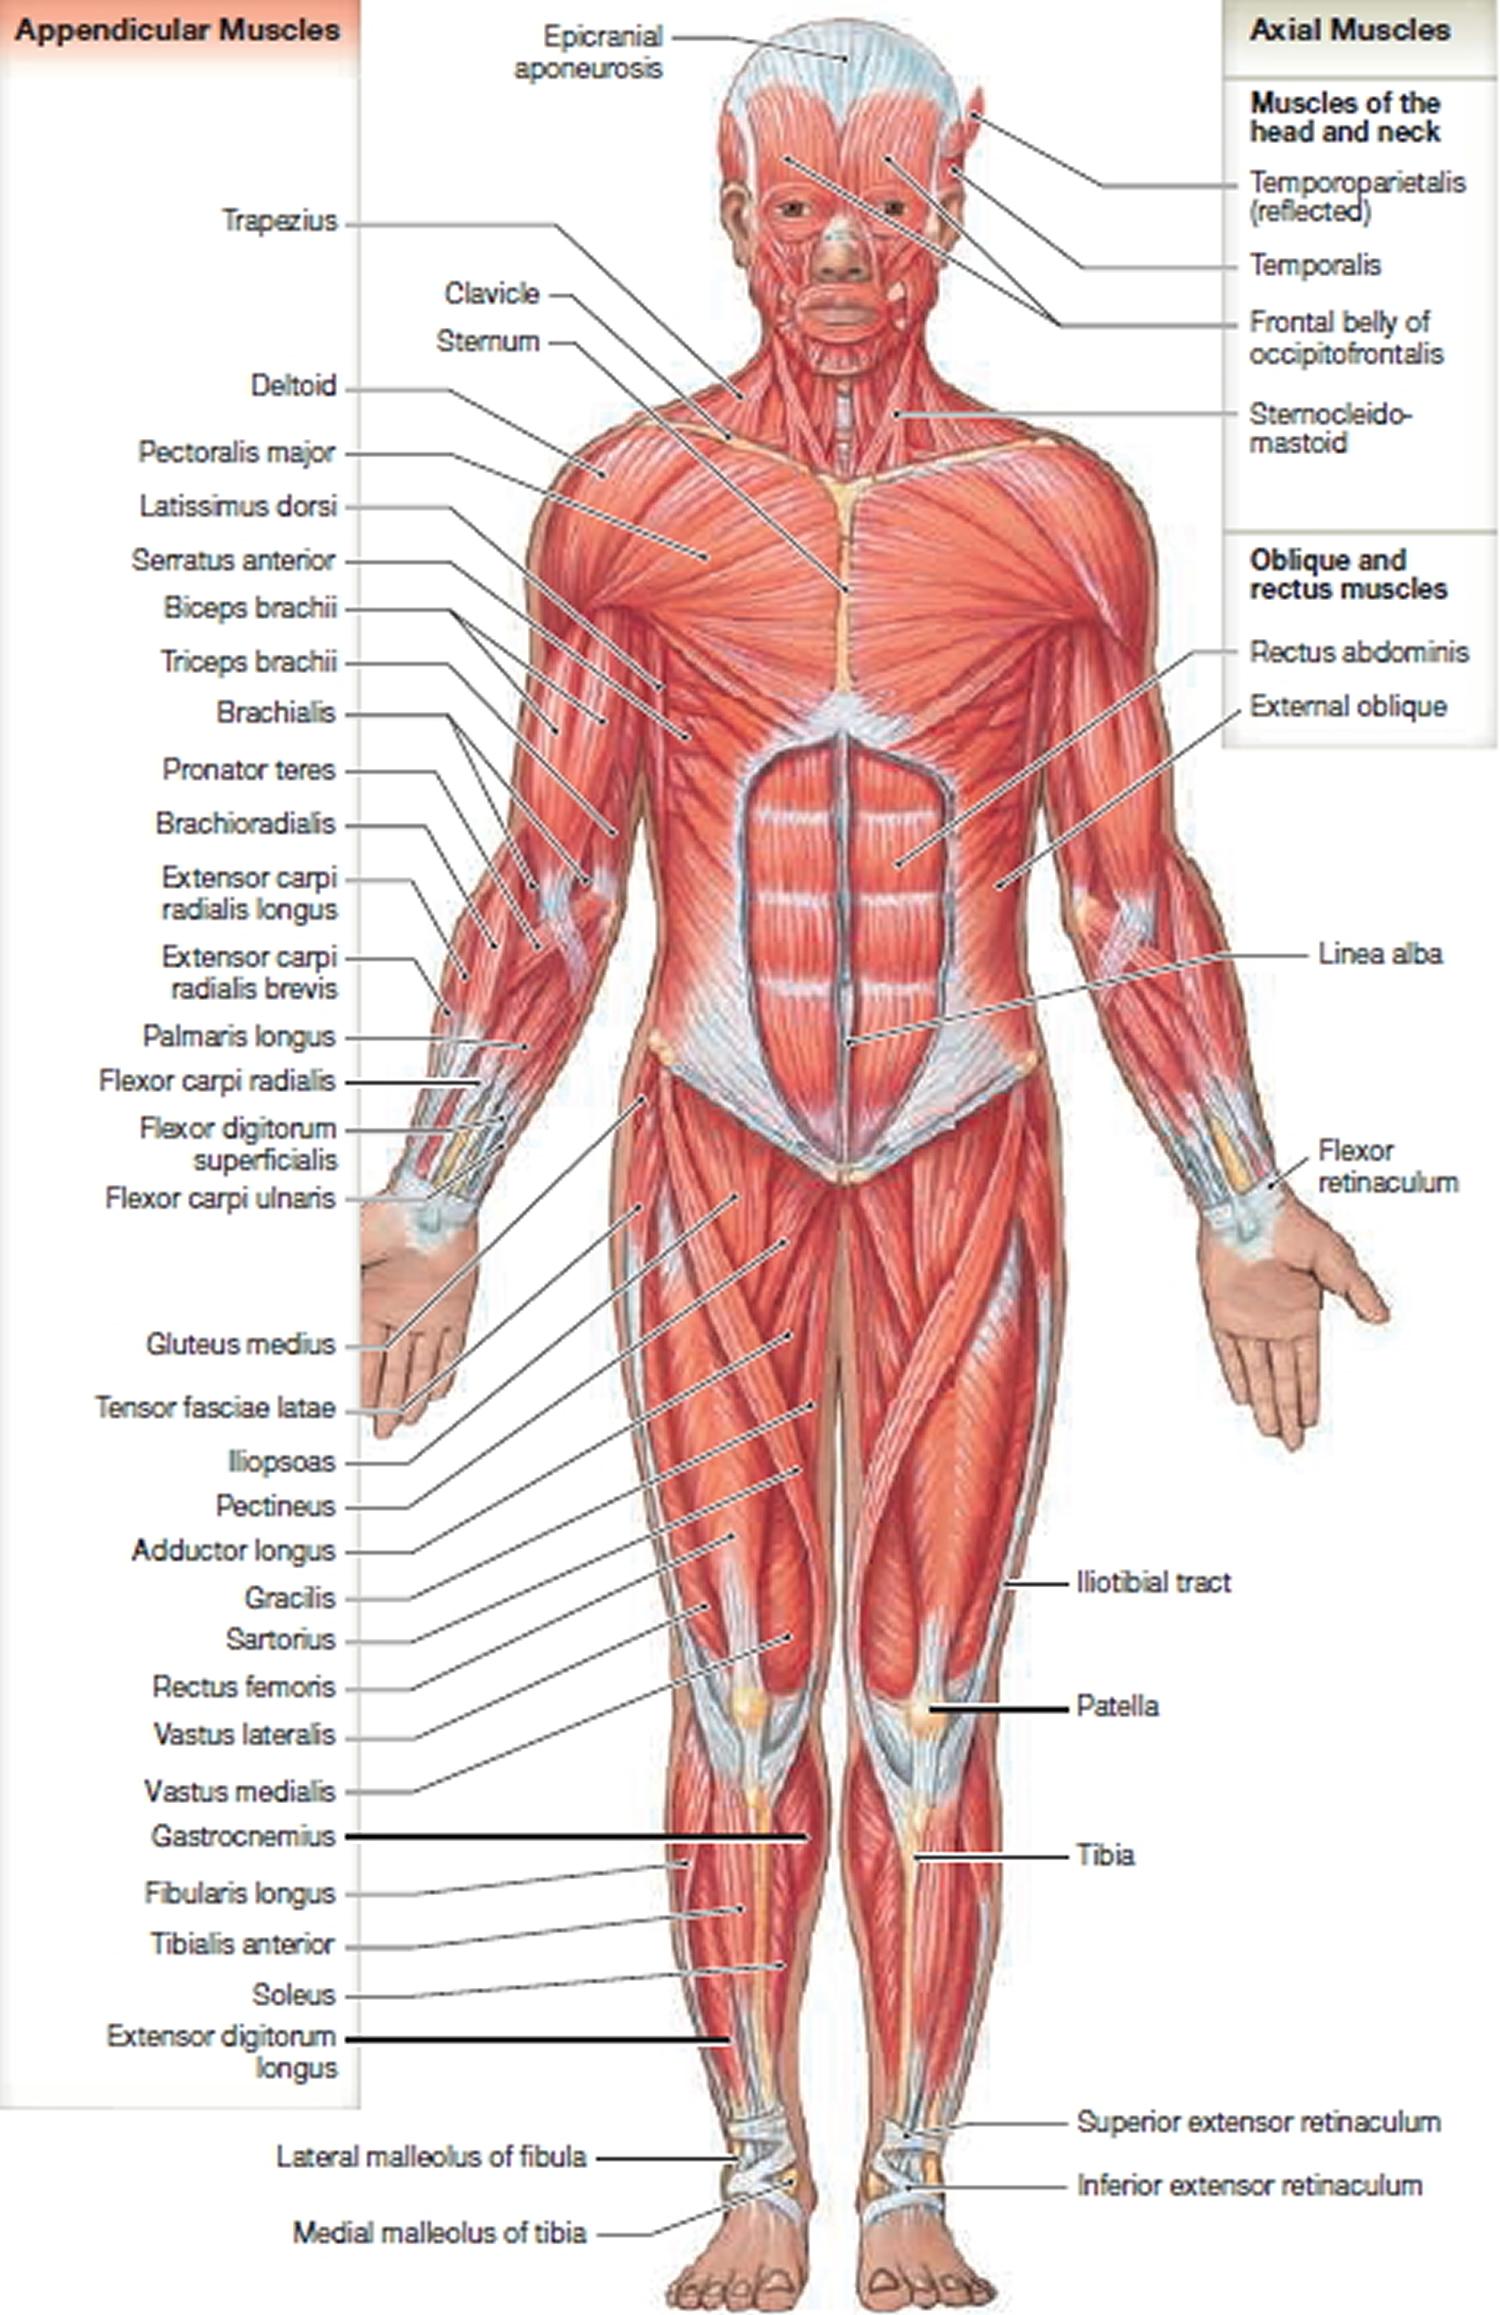 muscle anatomy